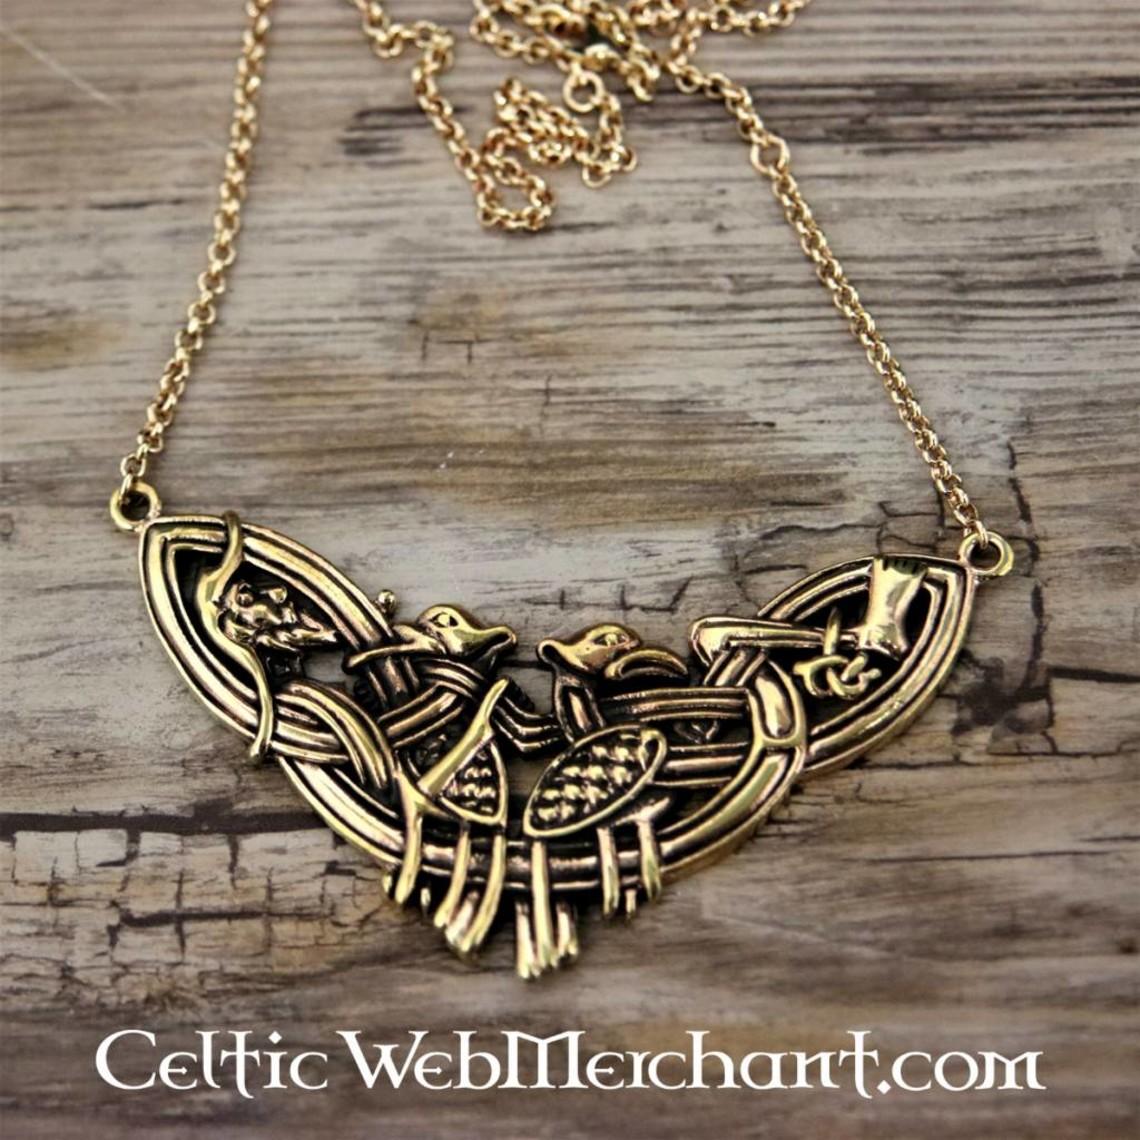 Irlandzki naszyjnik Book of Kells